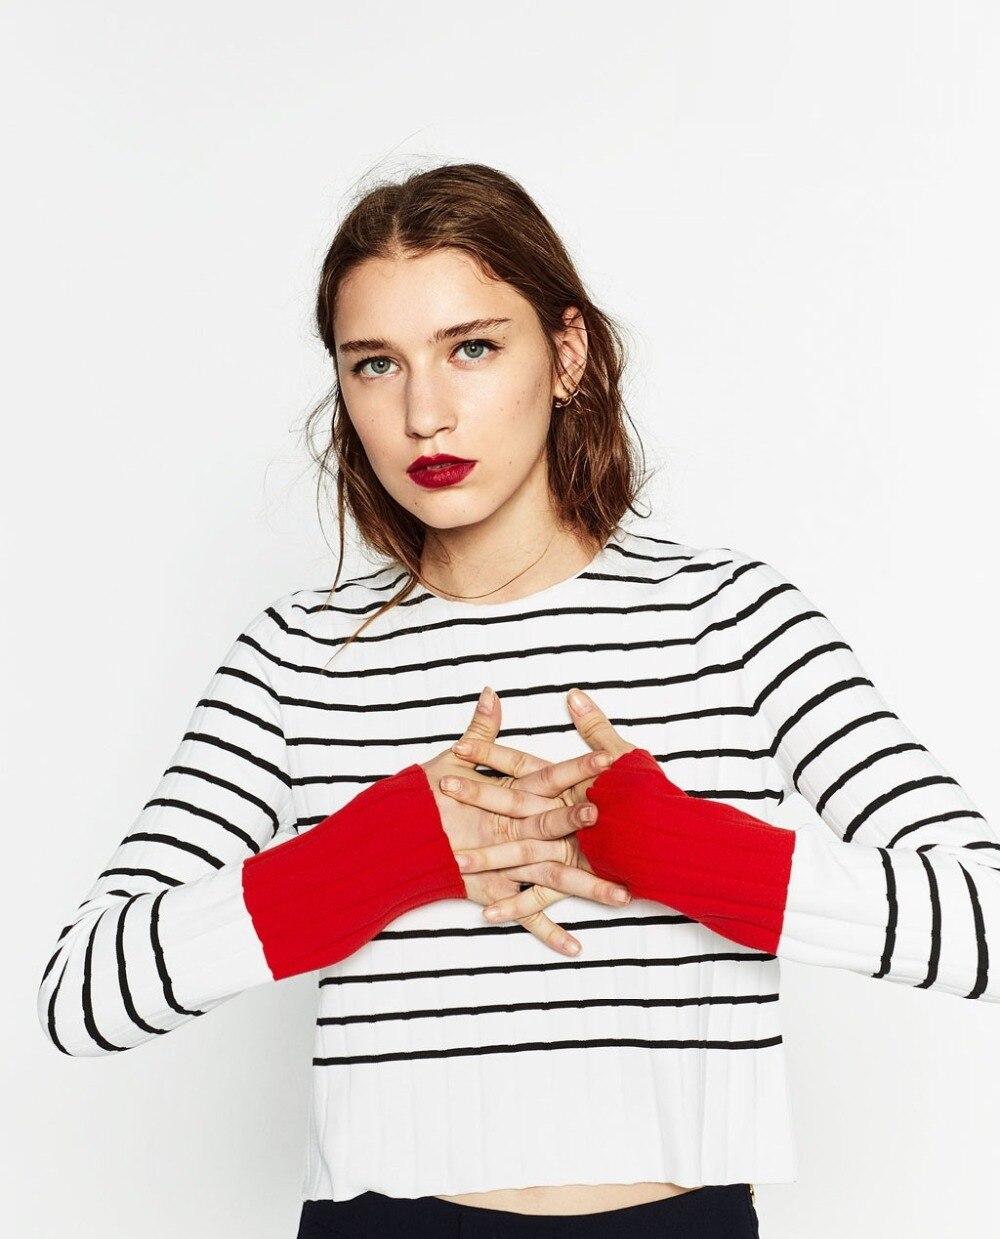 Europa Caliente o-cuello Mangas Largas Suéteres de Rayas Imprimen la Camisa Cort